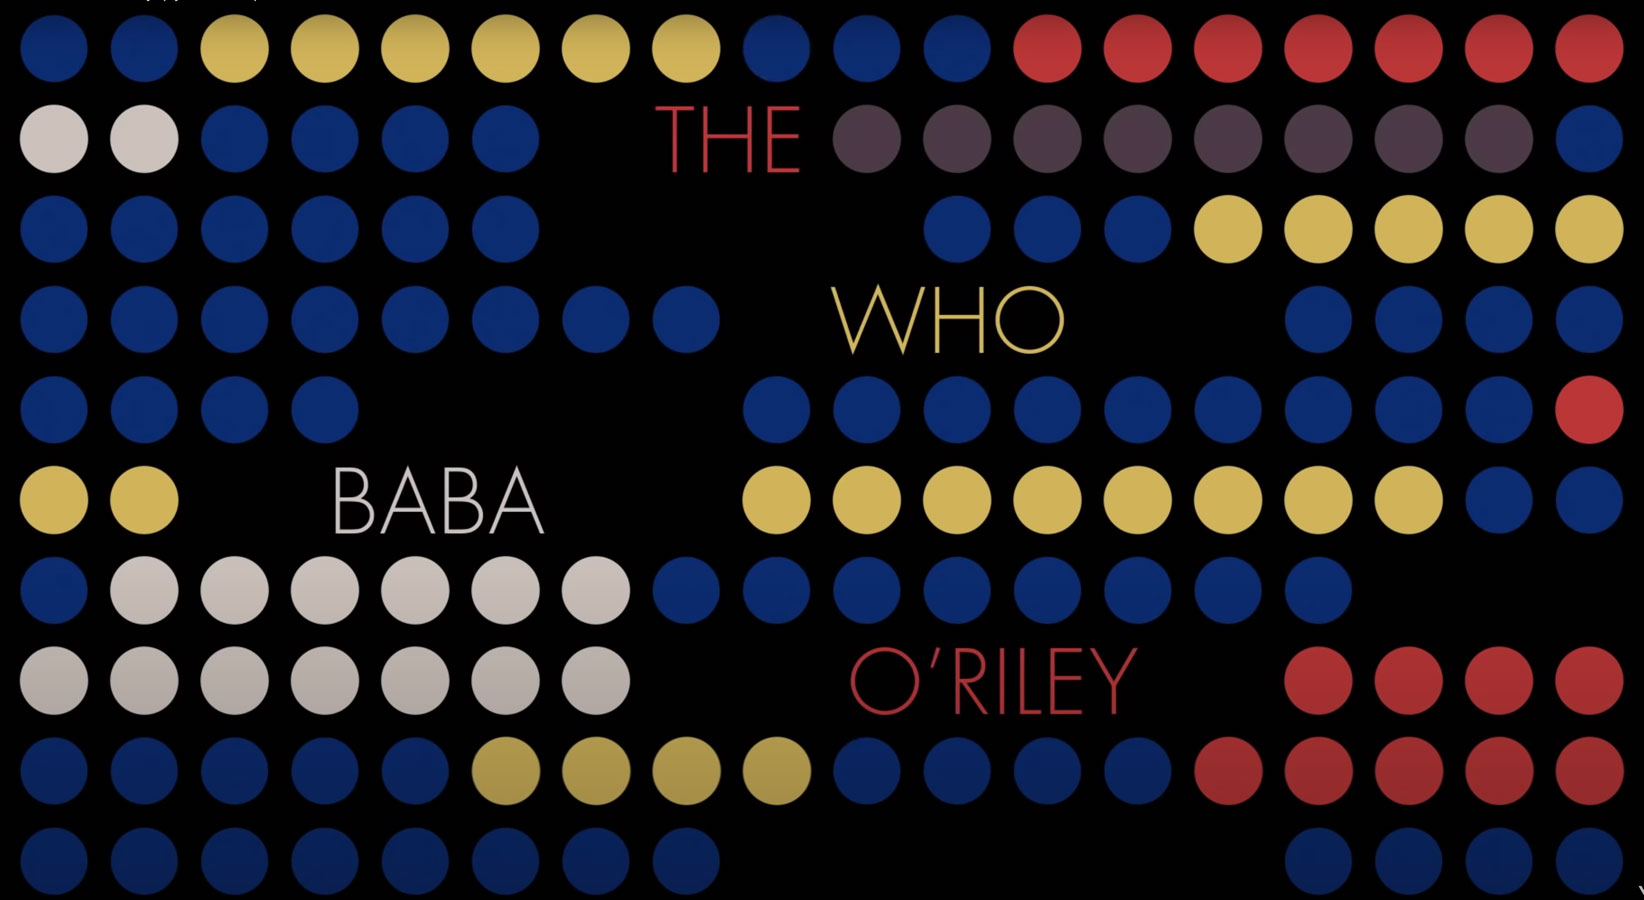 The Who 'Baba O'Riley' with lyrics